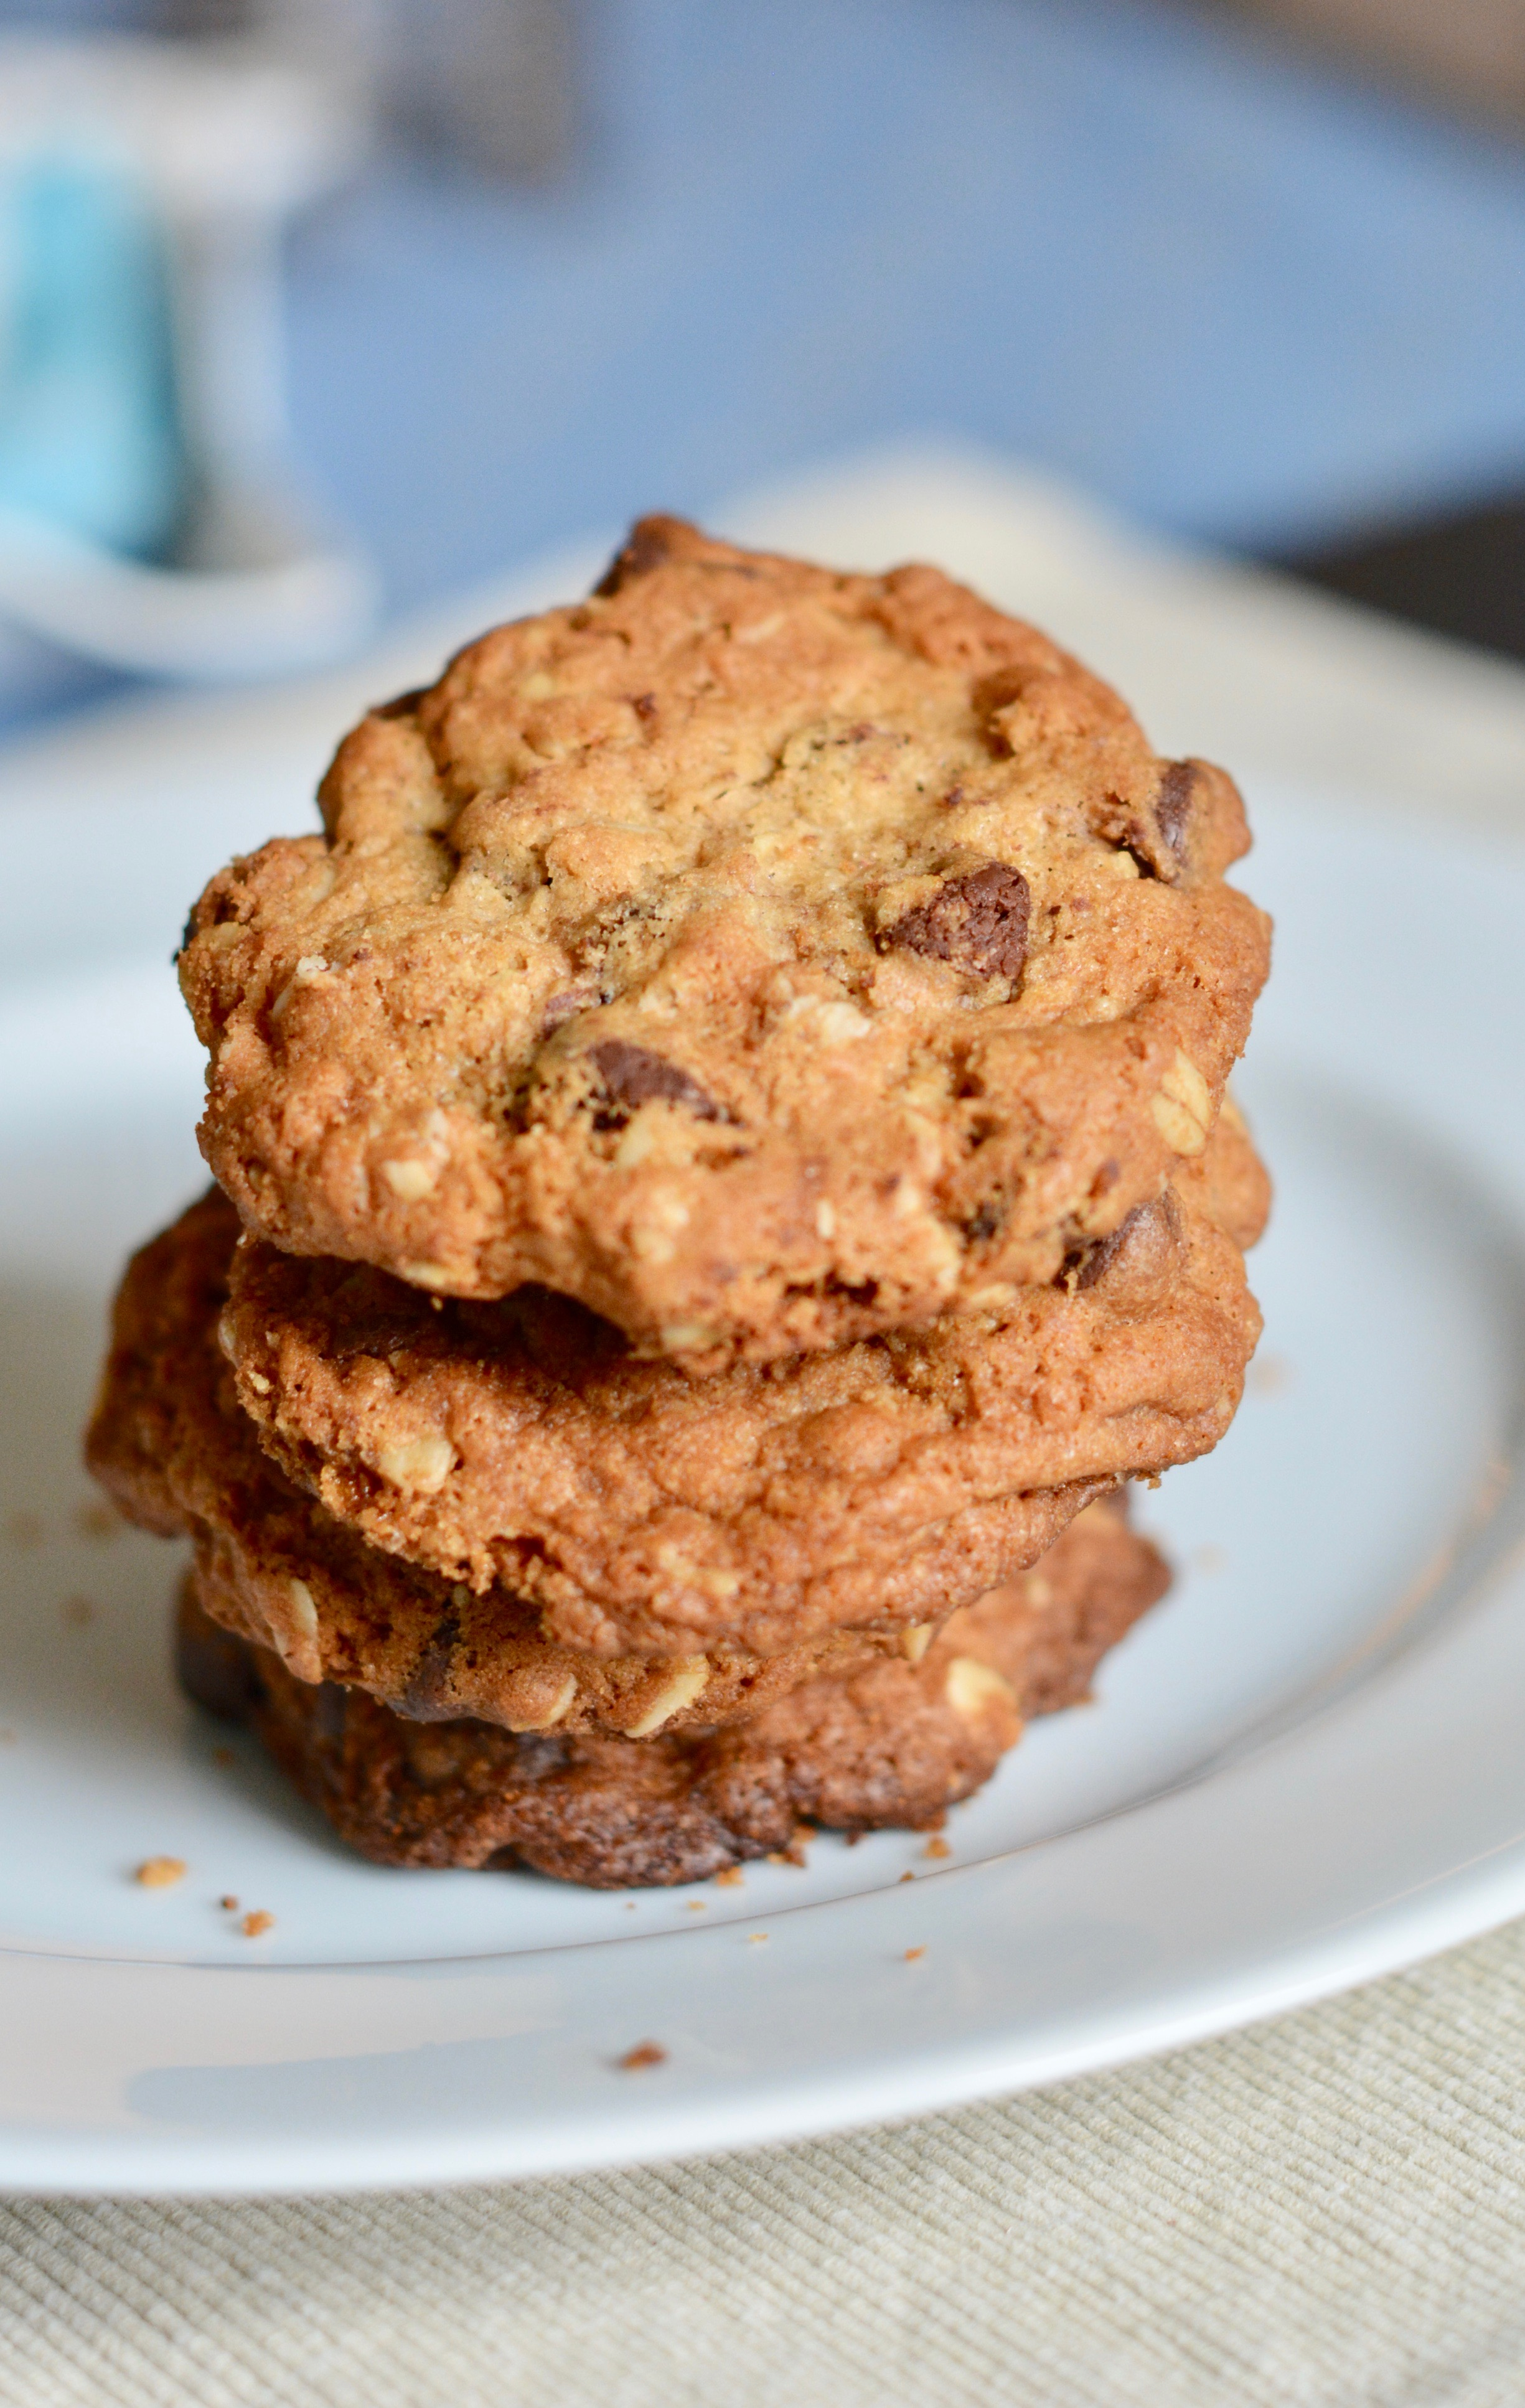 Cinnamon Oatmeal Chocolate Chip Cookies | The Naptime Chef